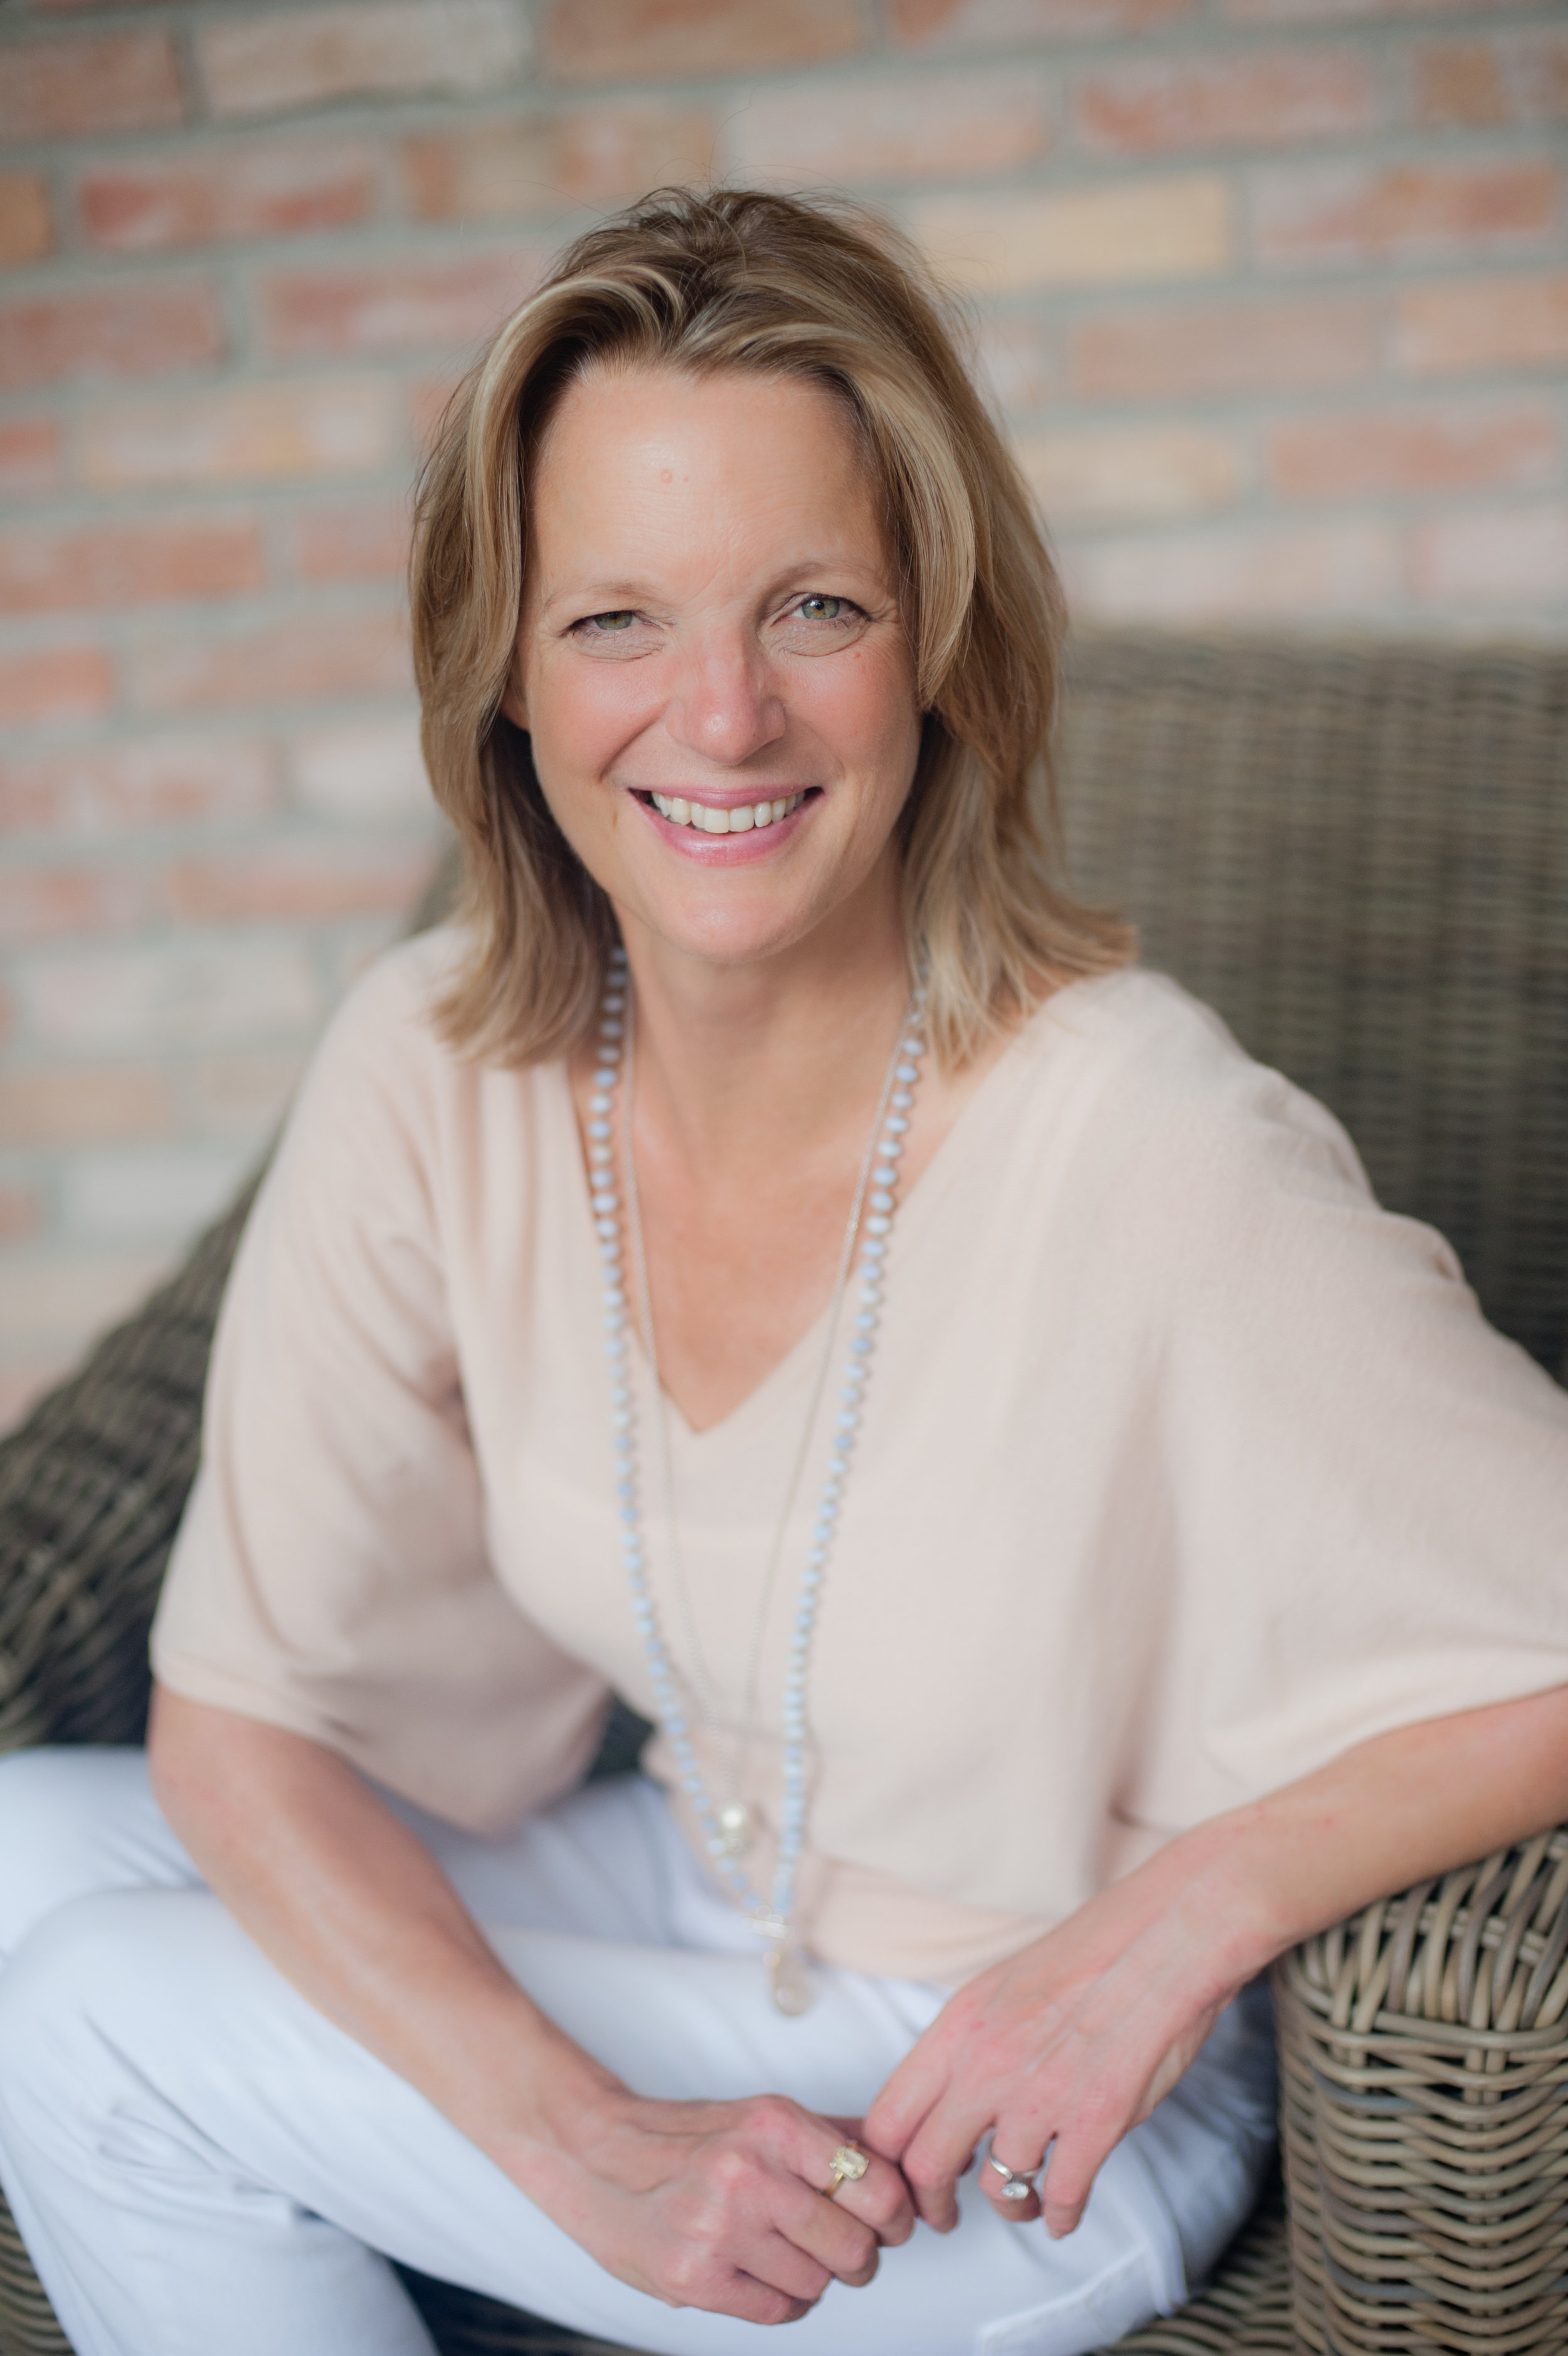 elizabeth-irvine-true-wellbeing-author-mentorship-counsel.jpg